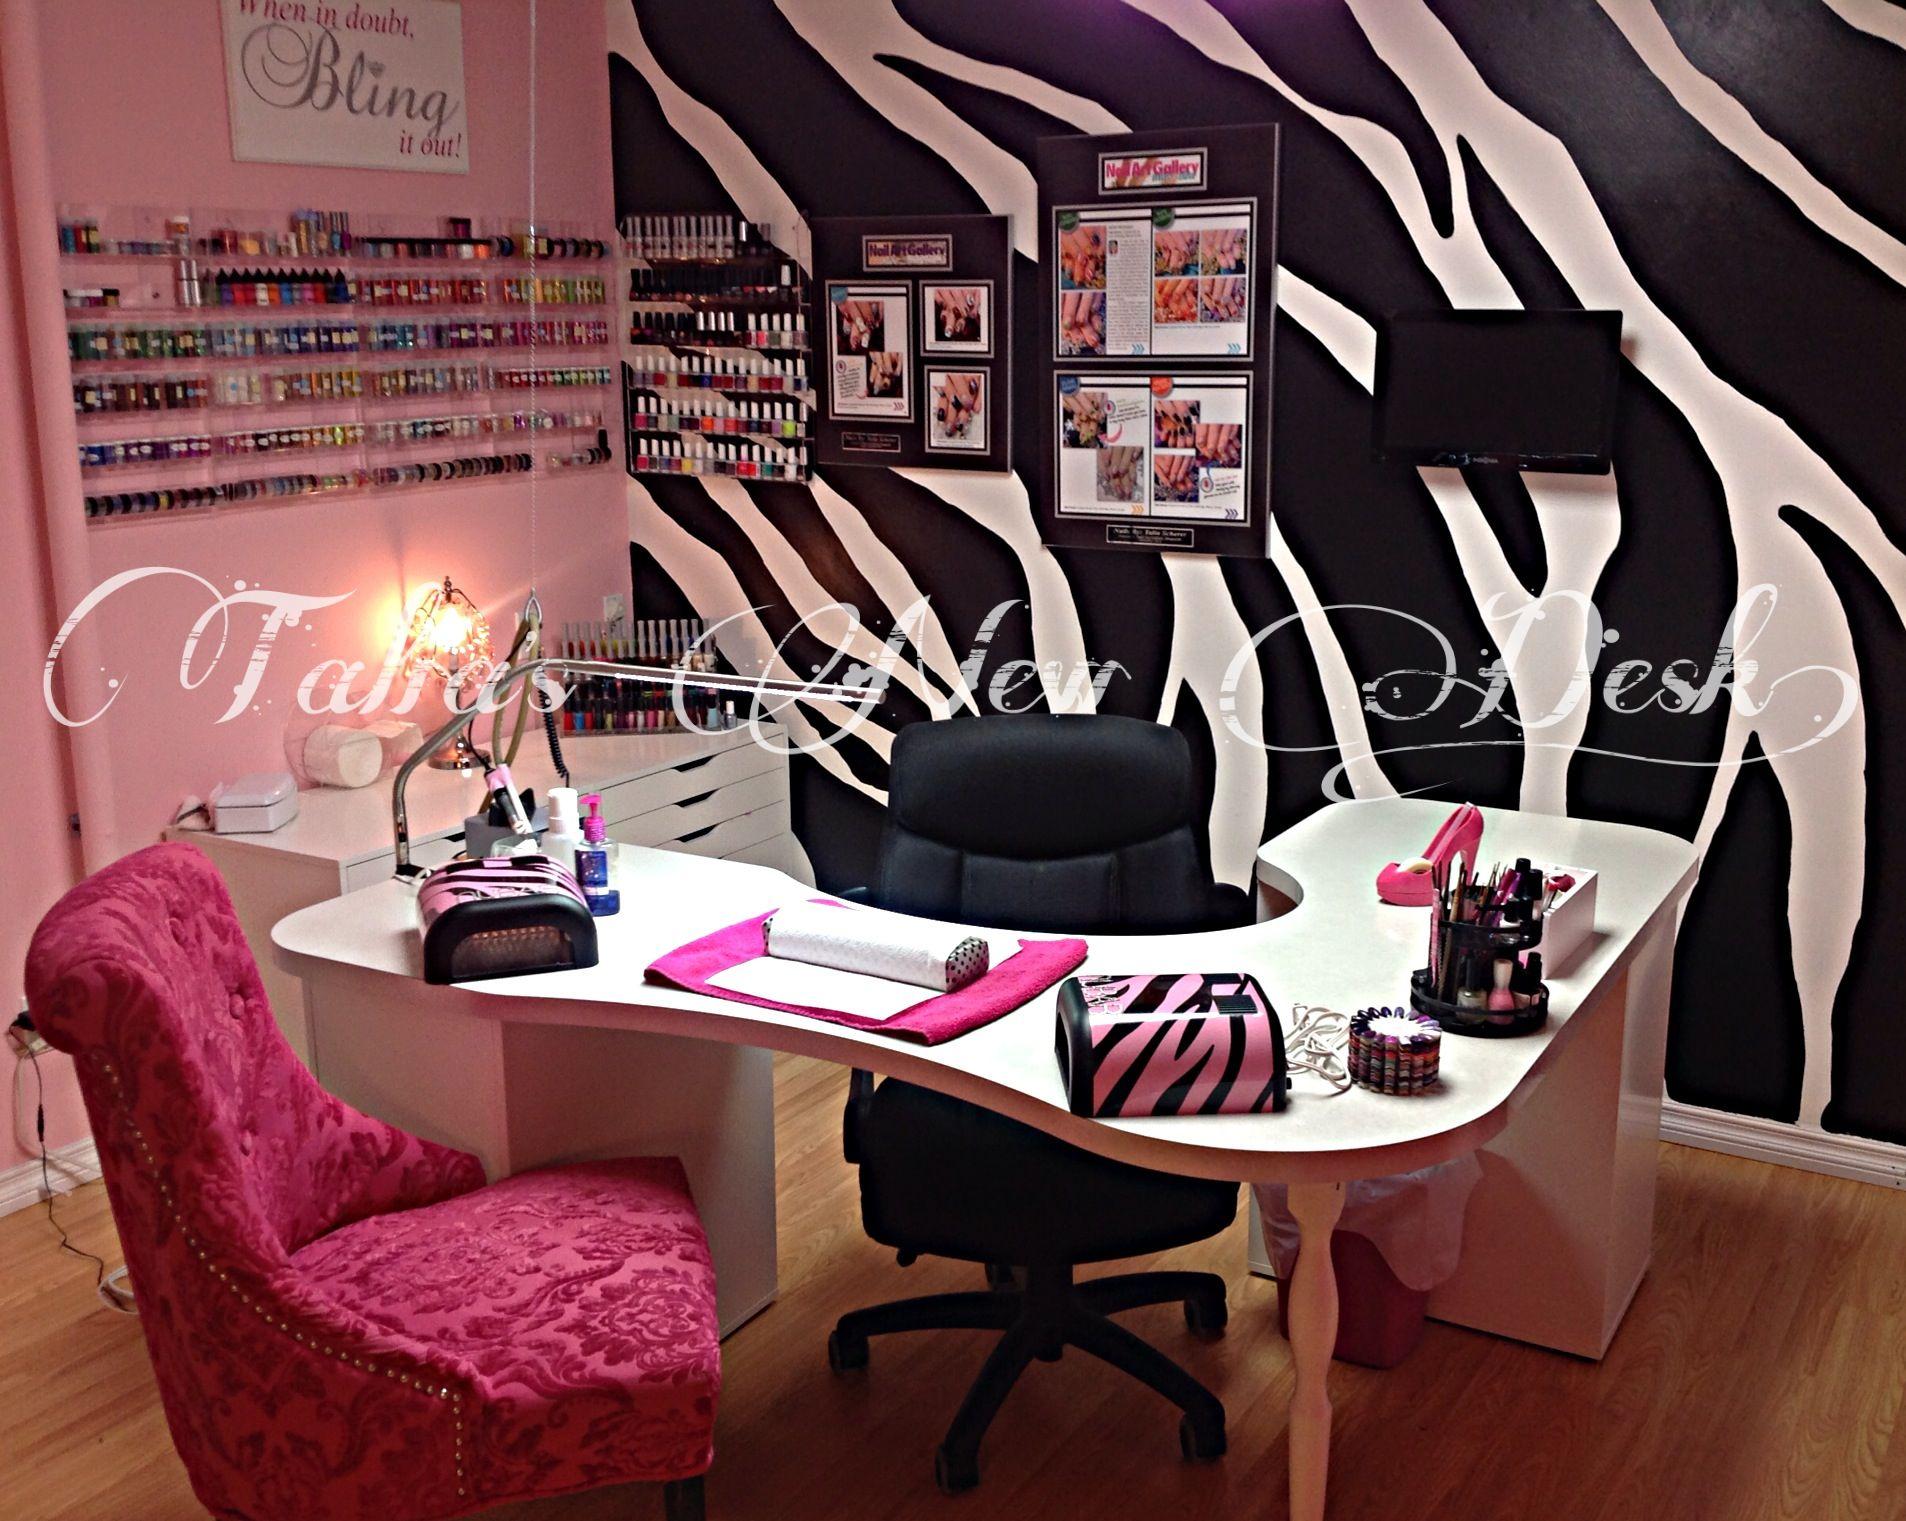 Nail salon the perfect meeting of entrepreneurship and